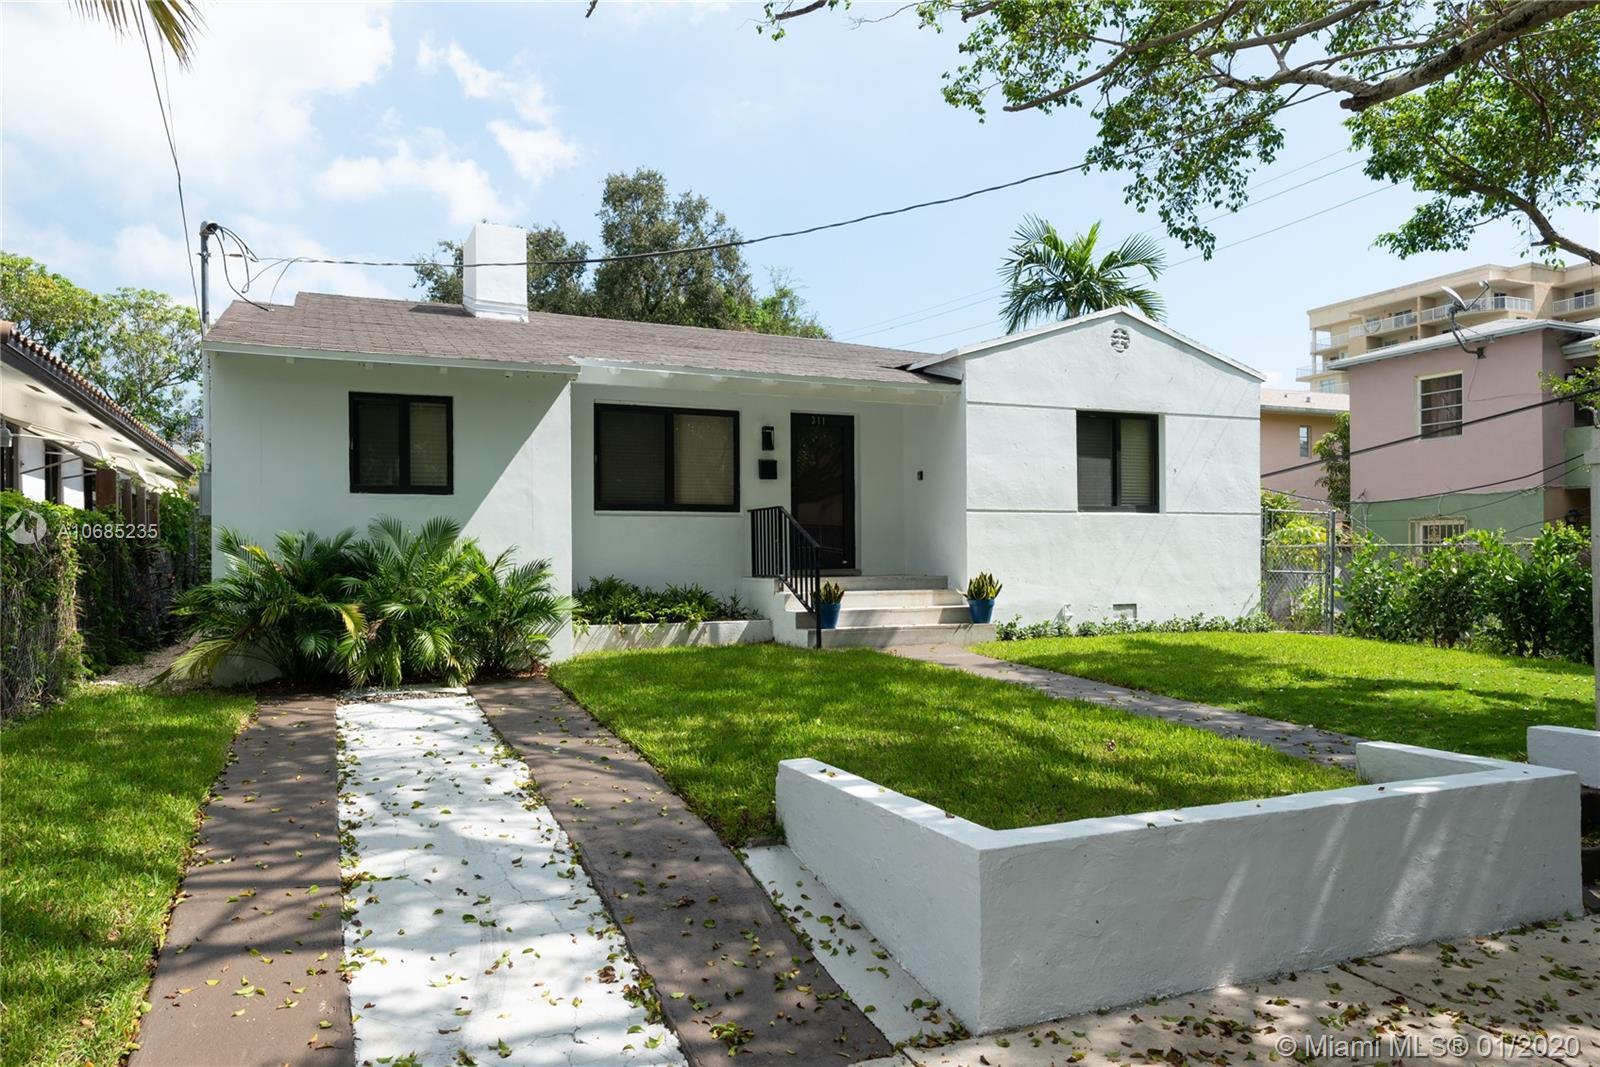 311 SW 21st Rd, Miami FL 33129